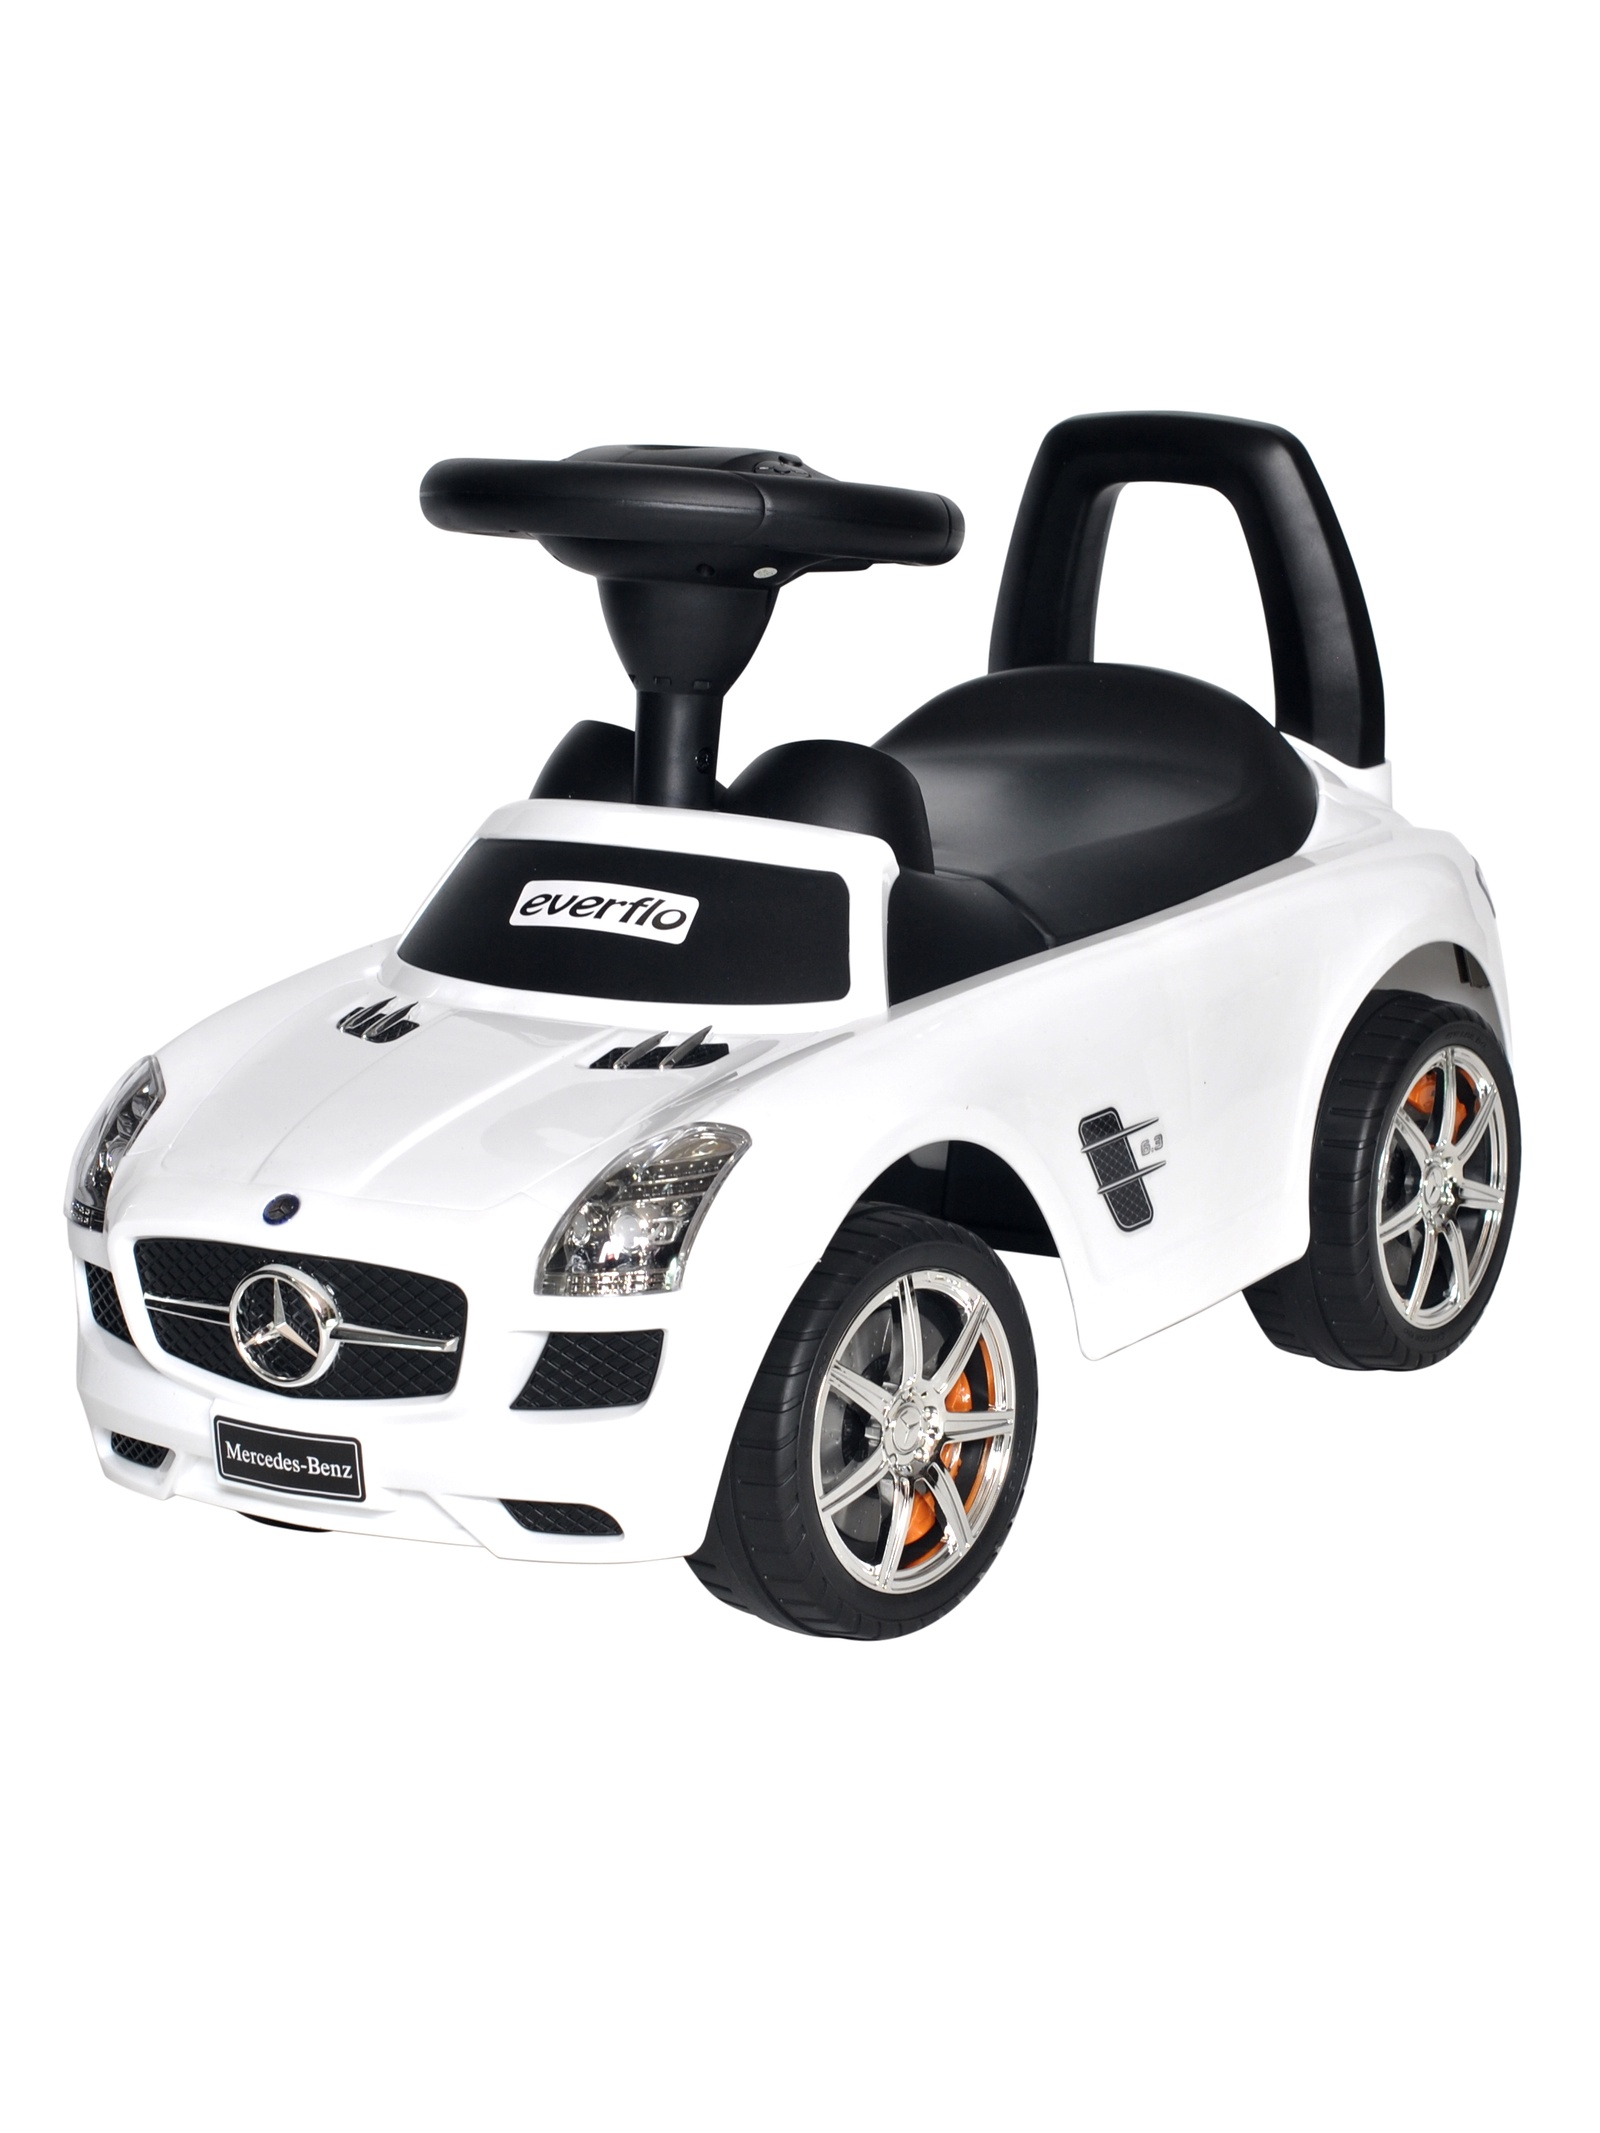 Каталка EVERFLO Mercedes-Benz EC-632, ПП100004306, белый